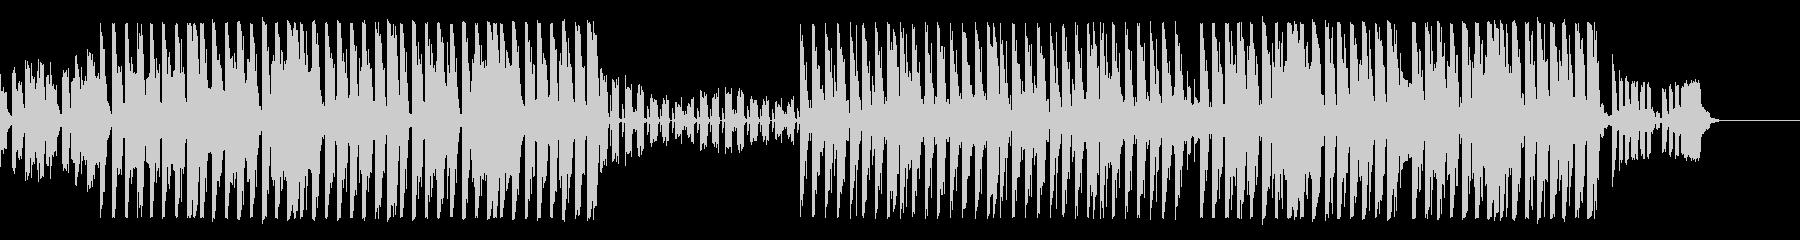 【Ba抜】可愛らしい雰囲気のピアノEDMの未再生の波形